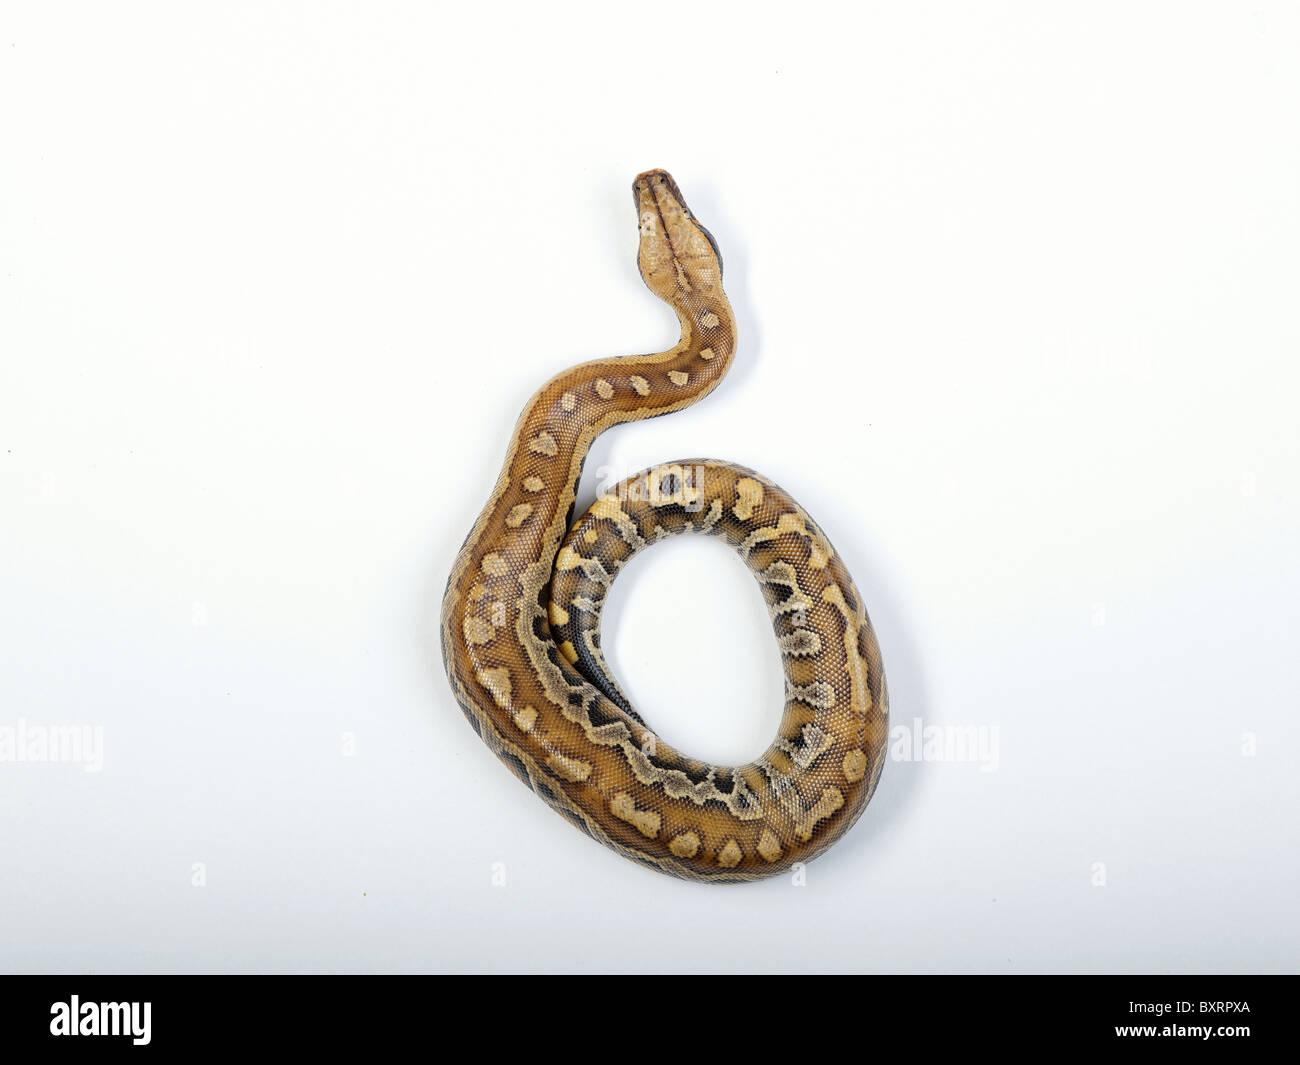 Blood python (Python curtus brongersmai) - Stock Image